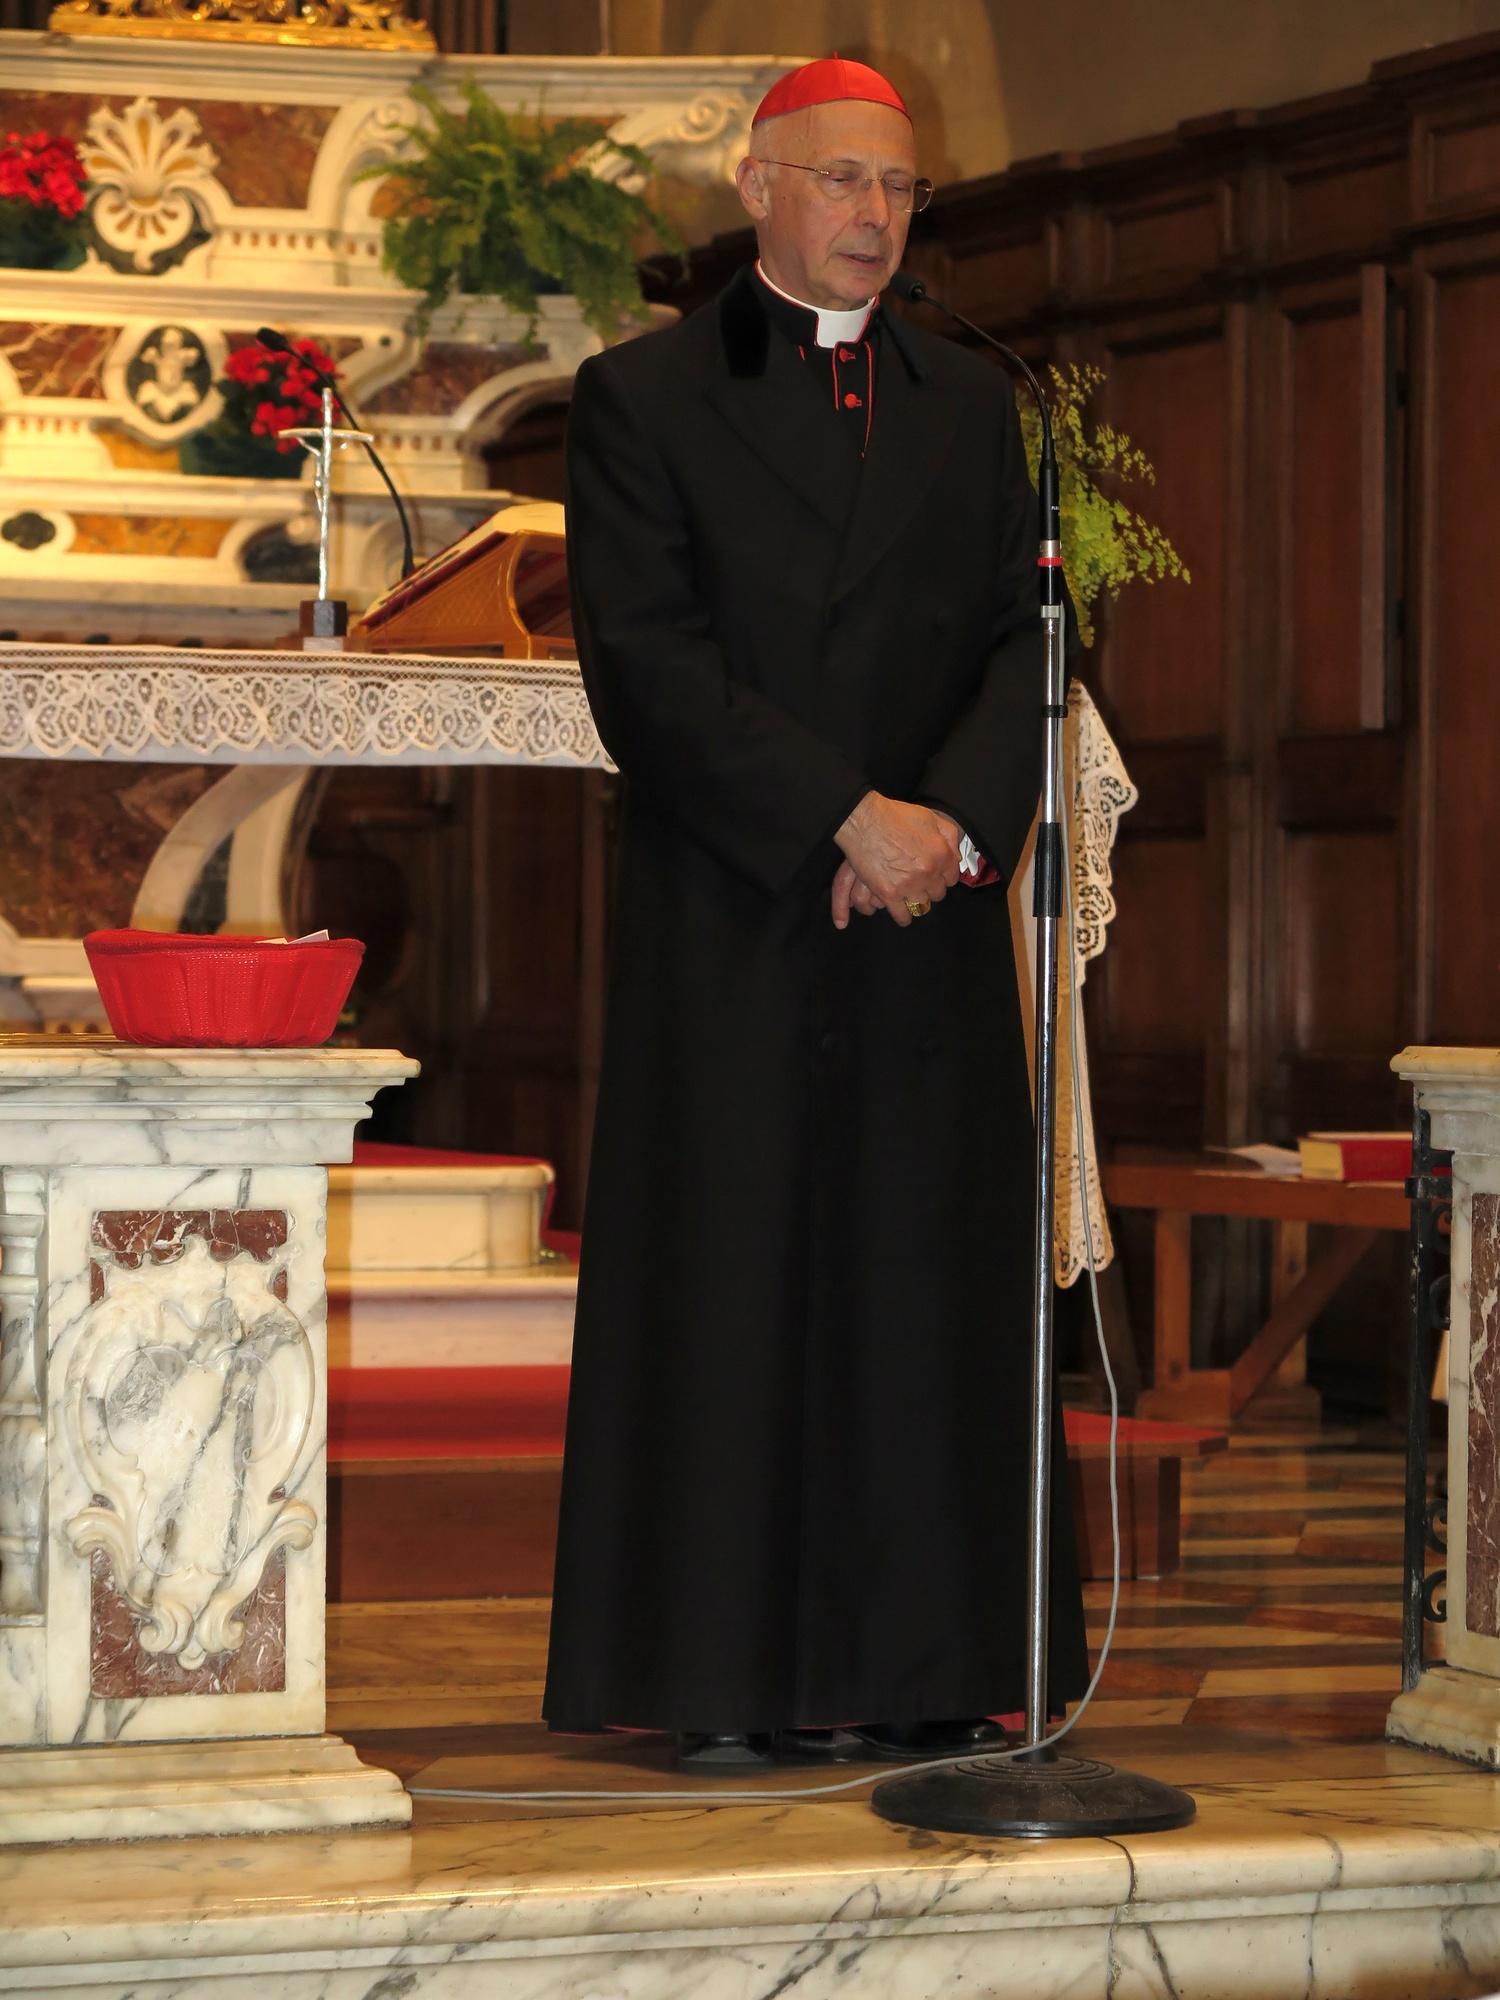 veglia-martiri-missionari-sturla-2016-04-02-21-37-17